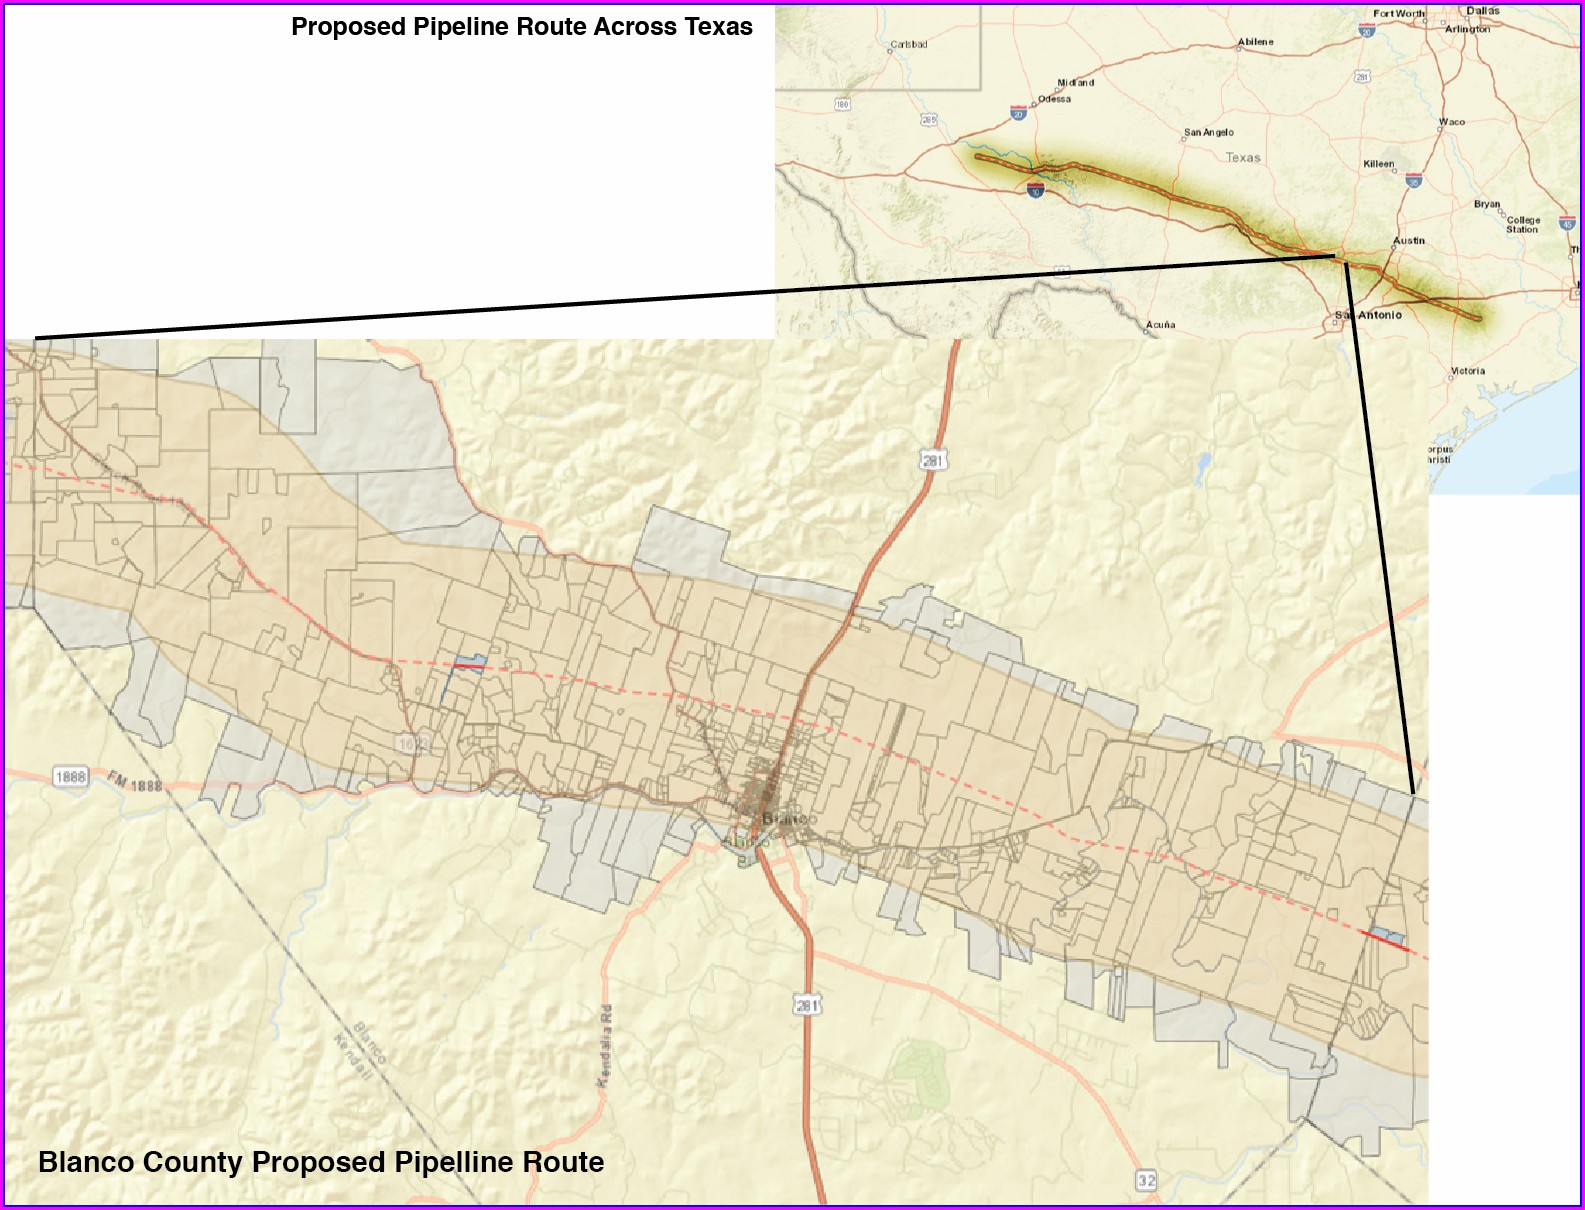 Kinder Morgan Pipeline Map Texas